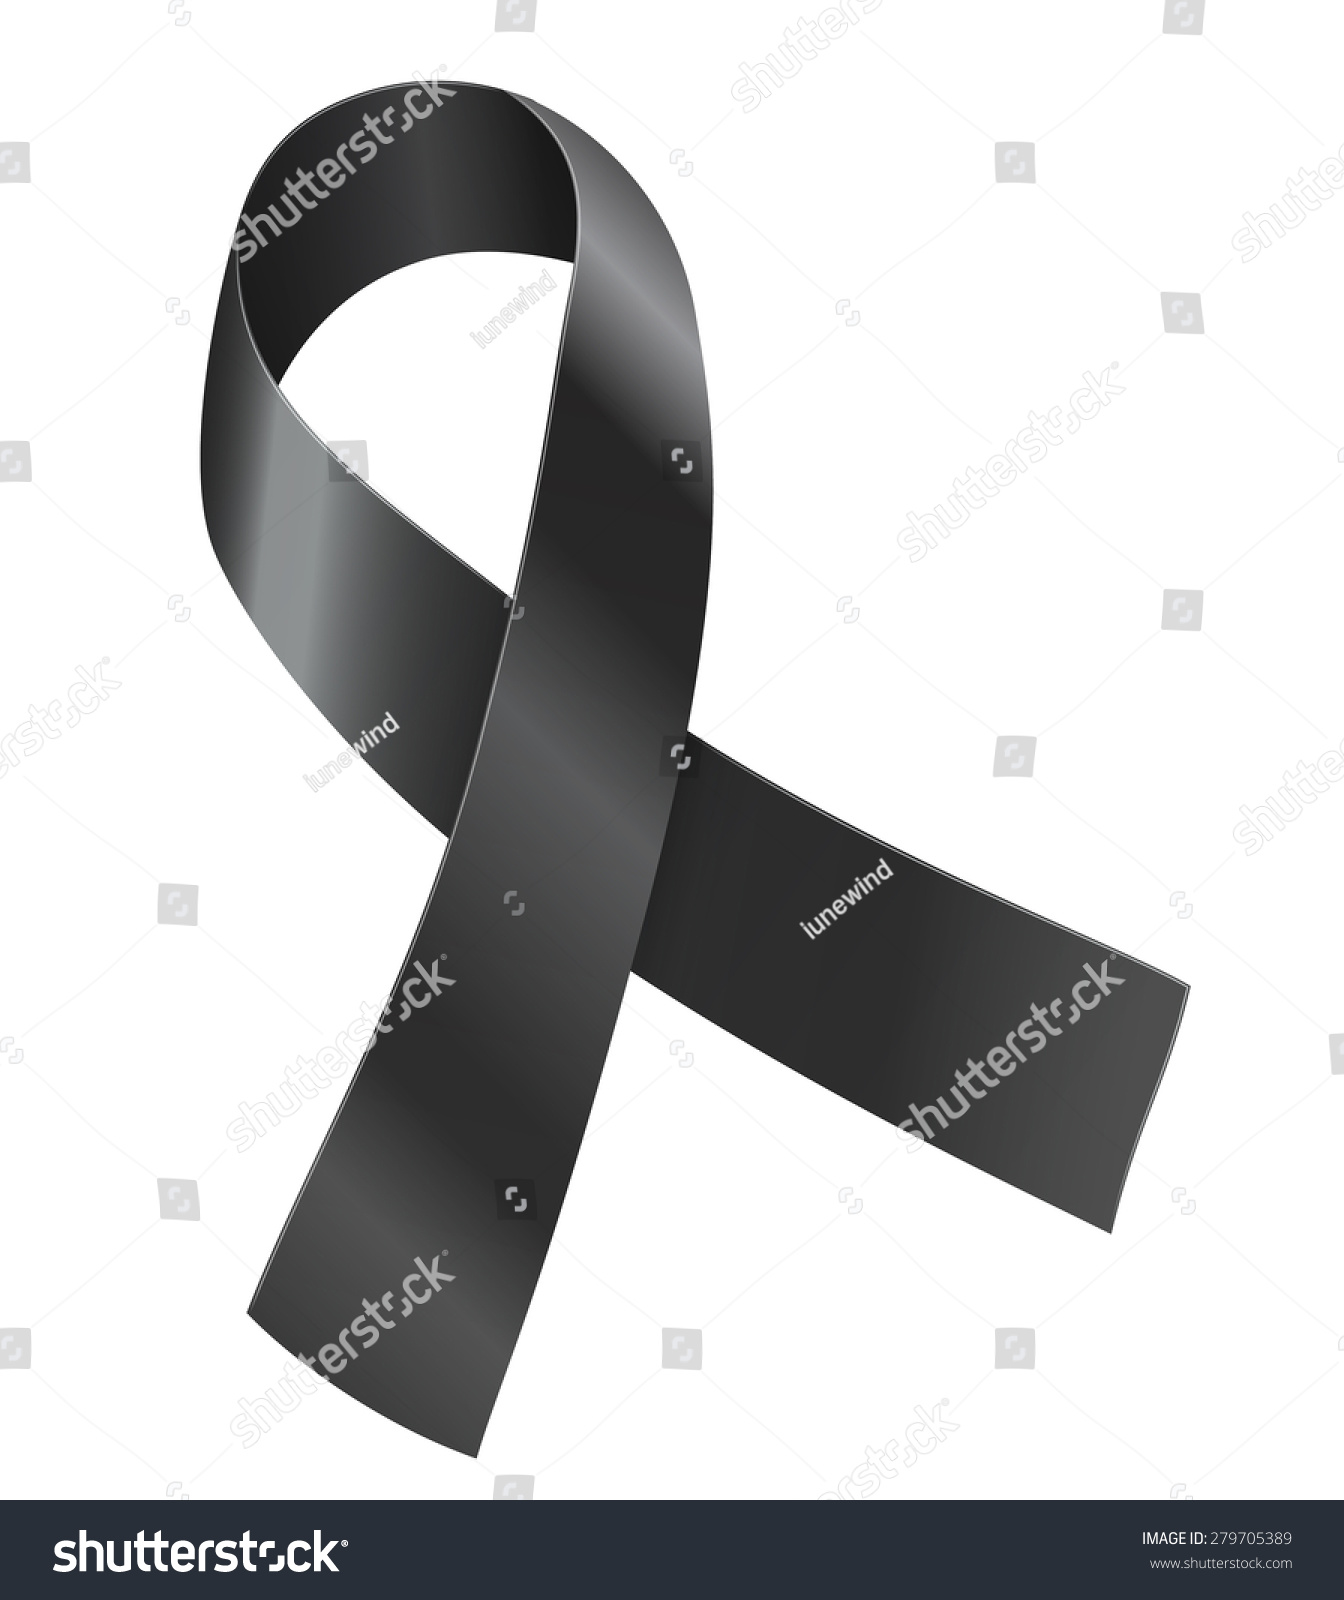 Black Ribbon Sickle Cell Disease 911 Stock Photo 279705389